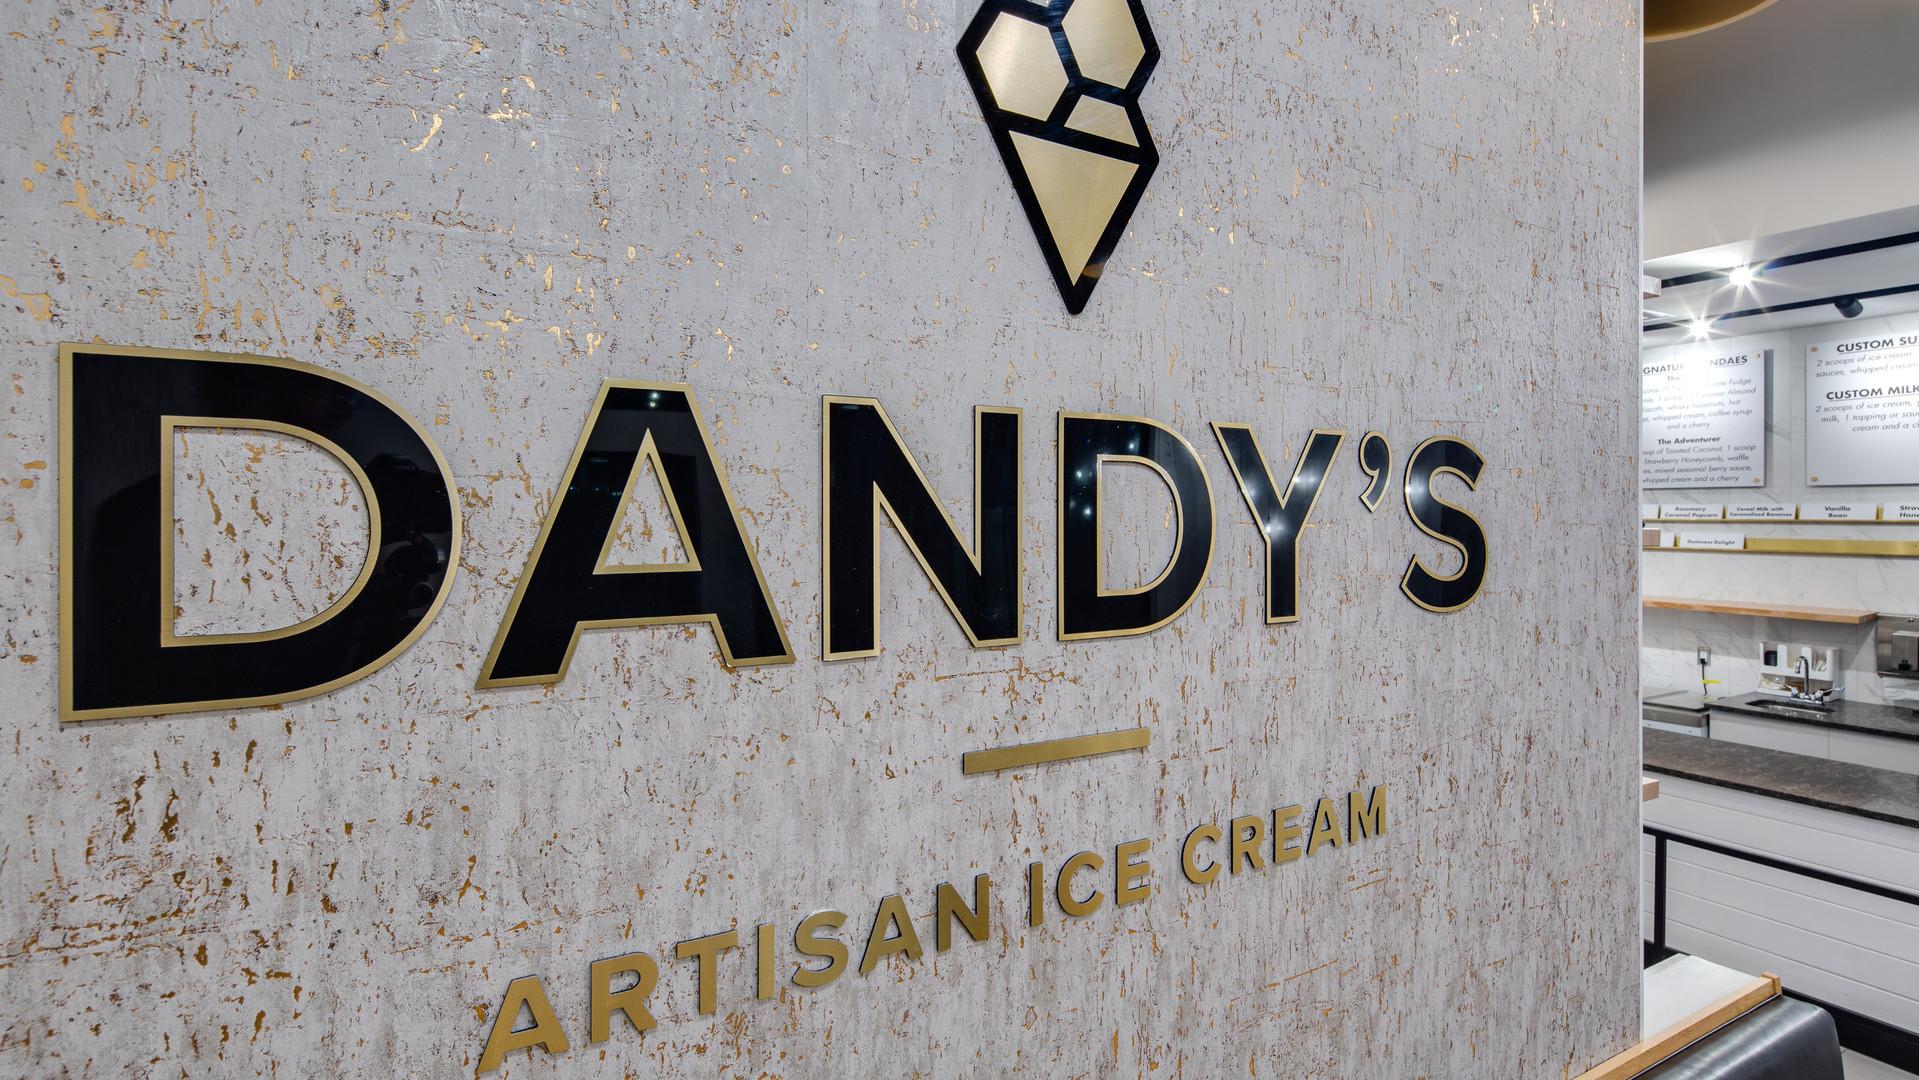 Branding Leads the Way